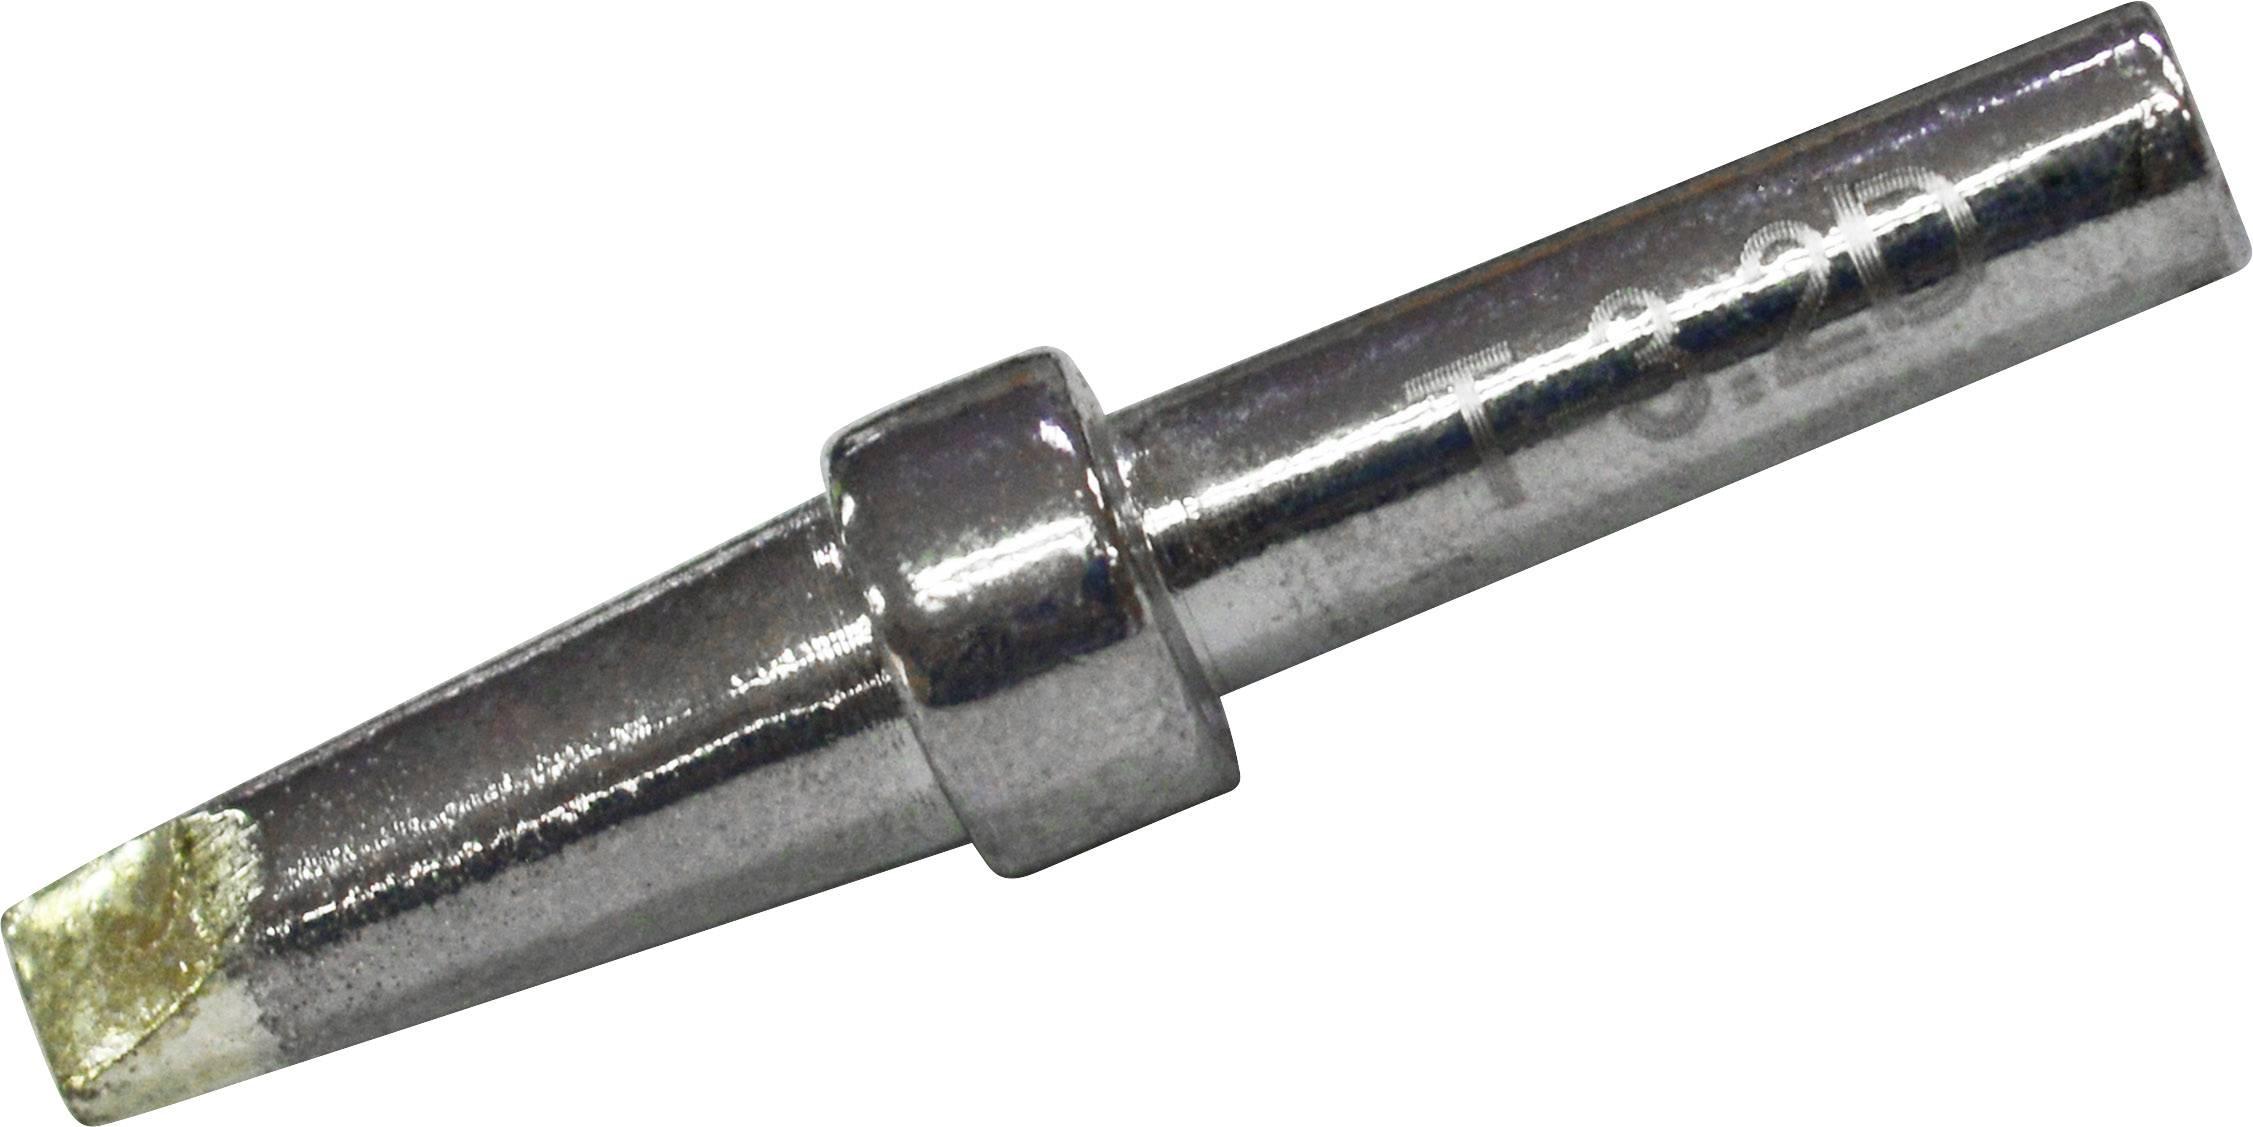 TOOLCRAFT HF-3,2MF L/ötspitze Mei/ßelform Spitzen-Gr/ö/ße 3.2 mm Spitzen-L/änge 17 mm Inhalt 1 St.